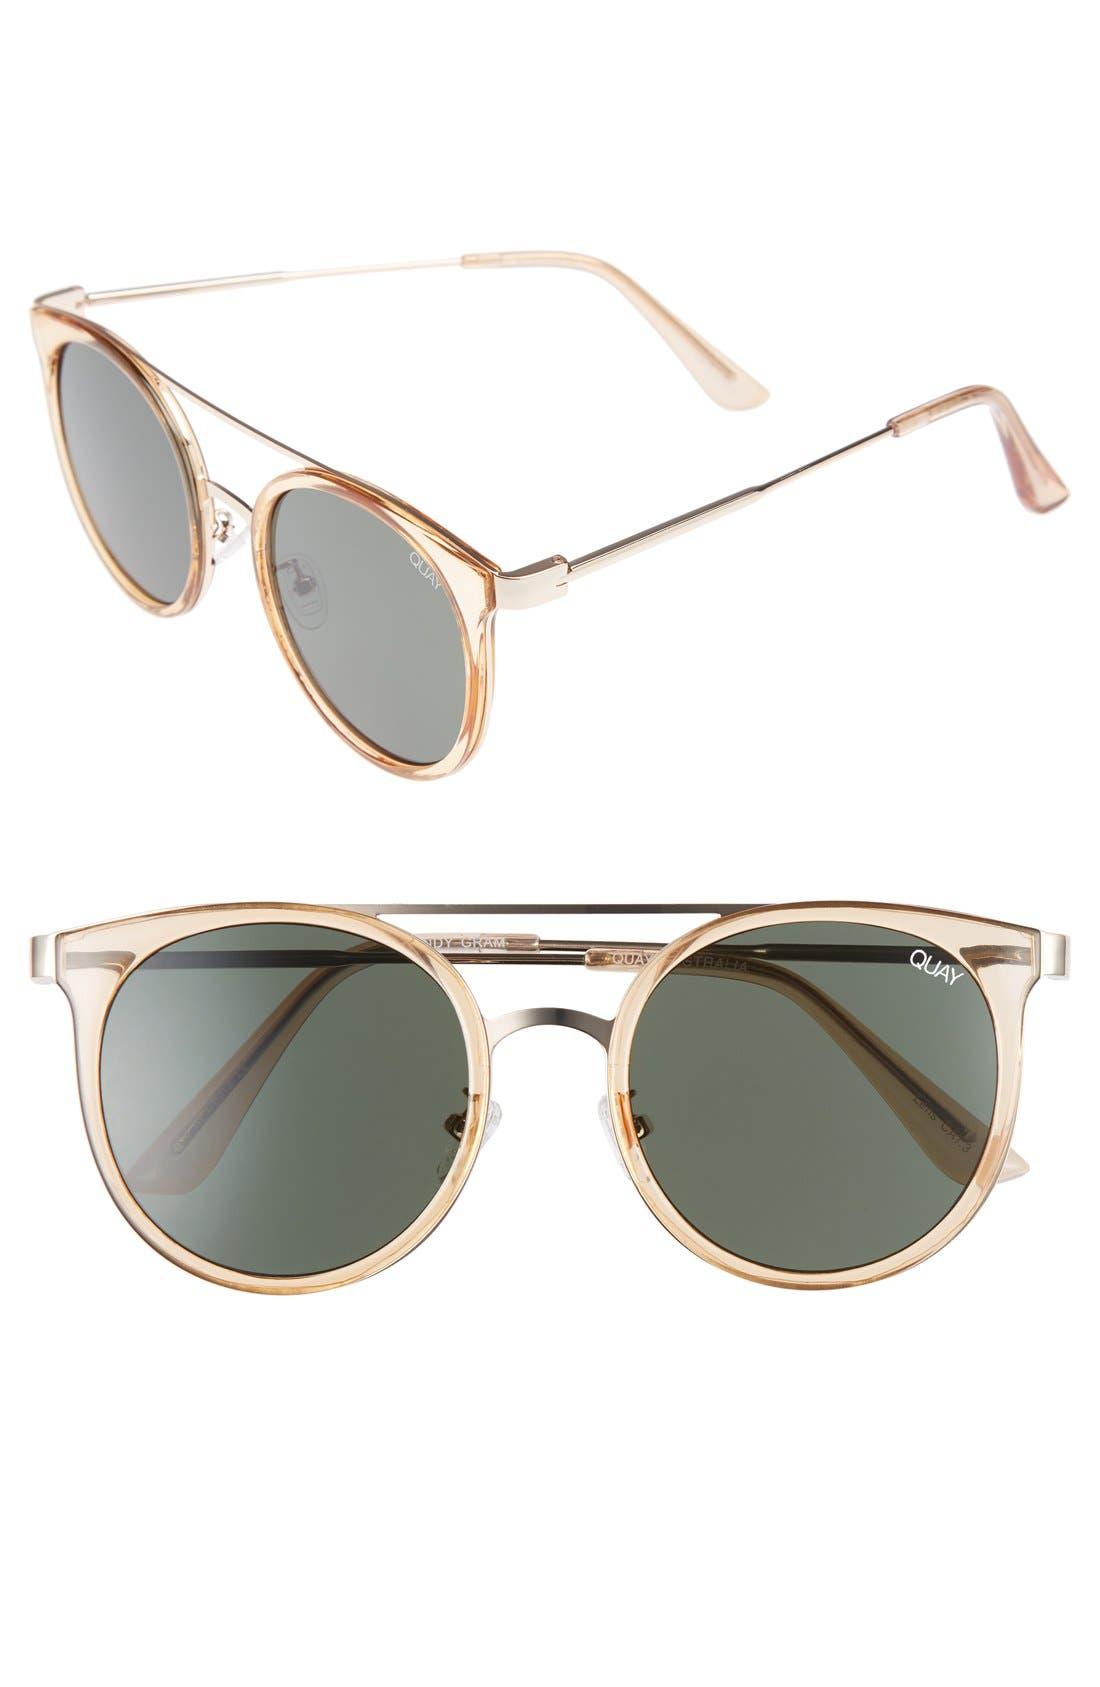 Quay Australia Kandy Gram 51mm Round Sunglasses